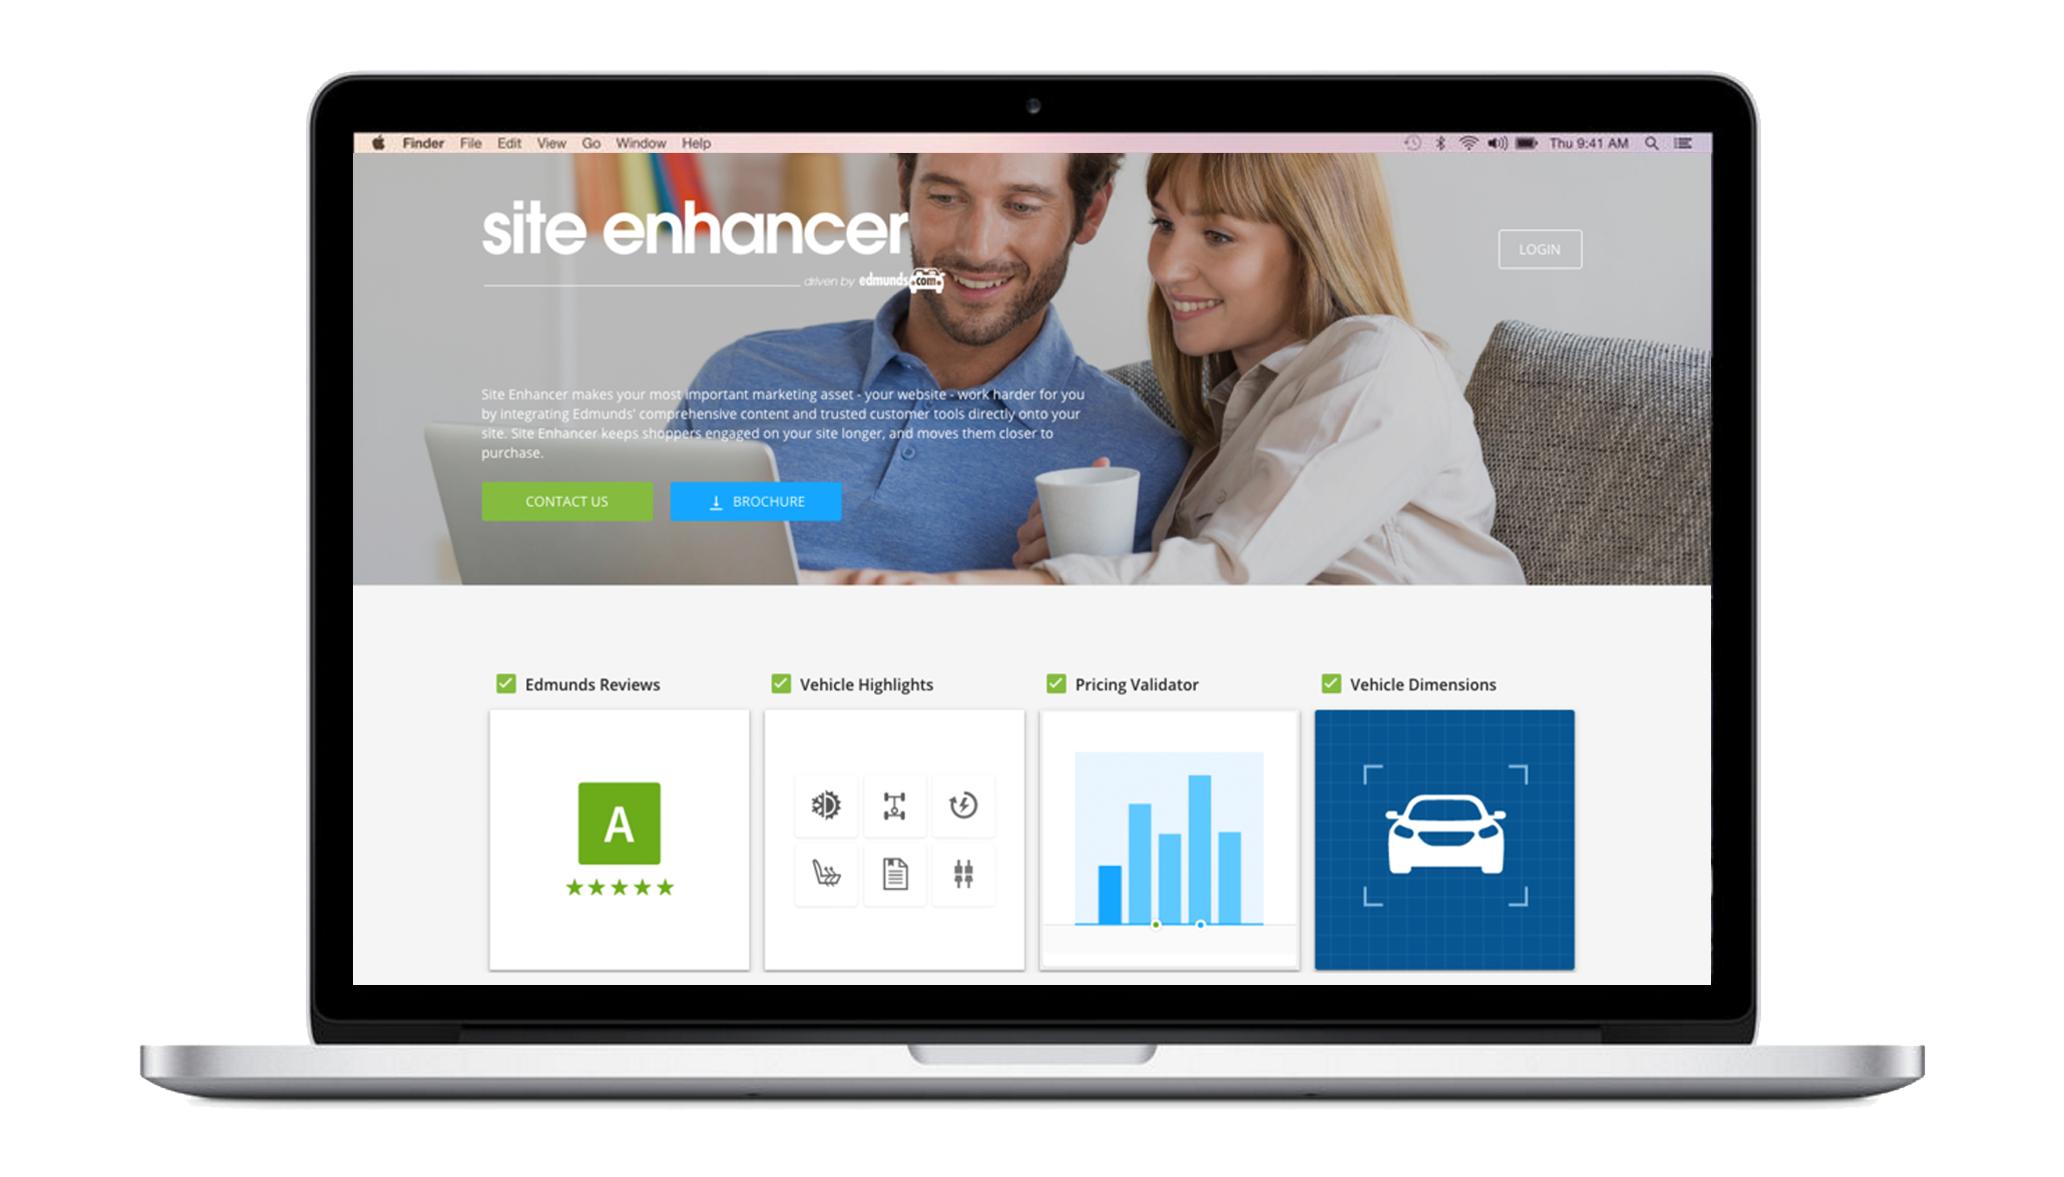 SiteEnhancer_PC2.png